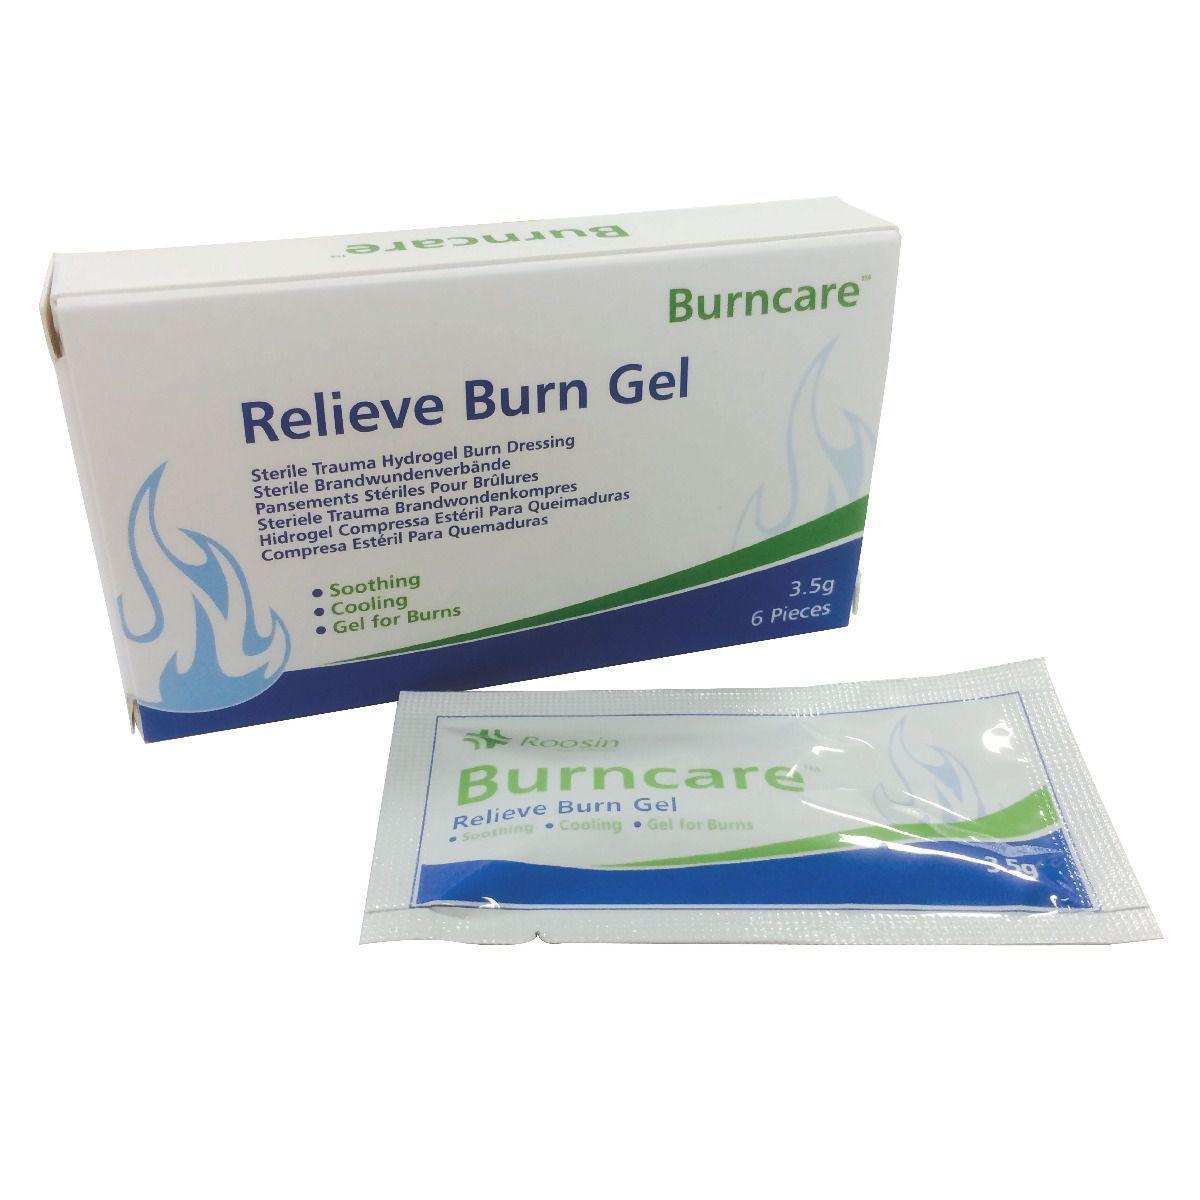 burncare gel sachet 35 gram per 100 stuks in een zak